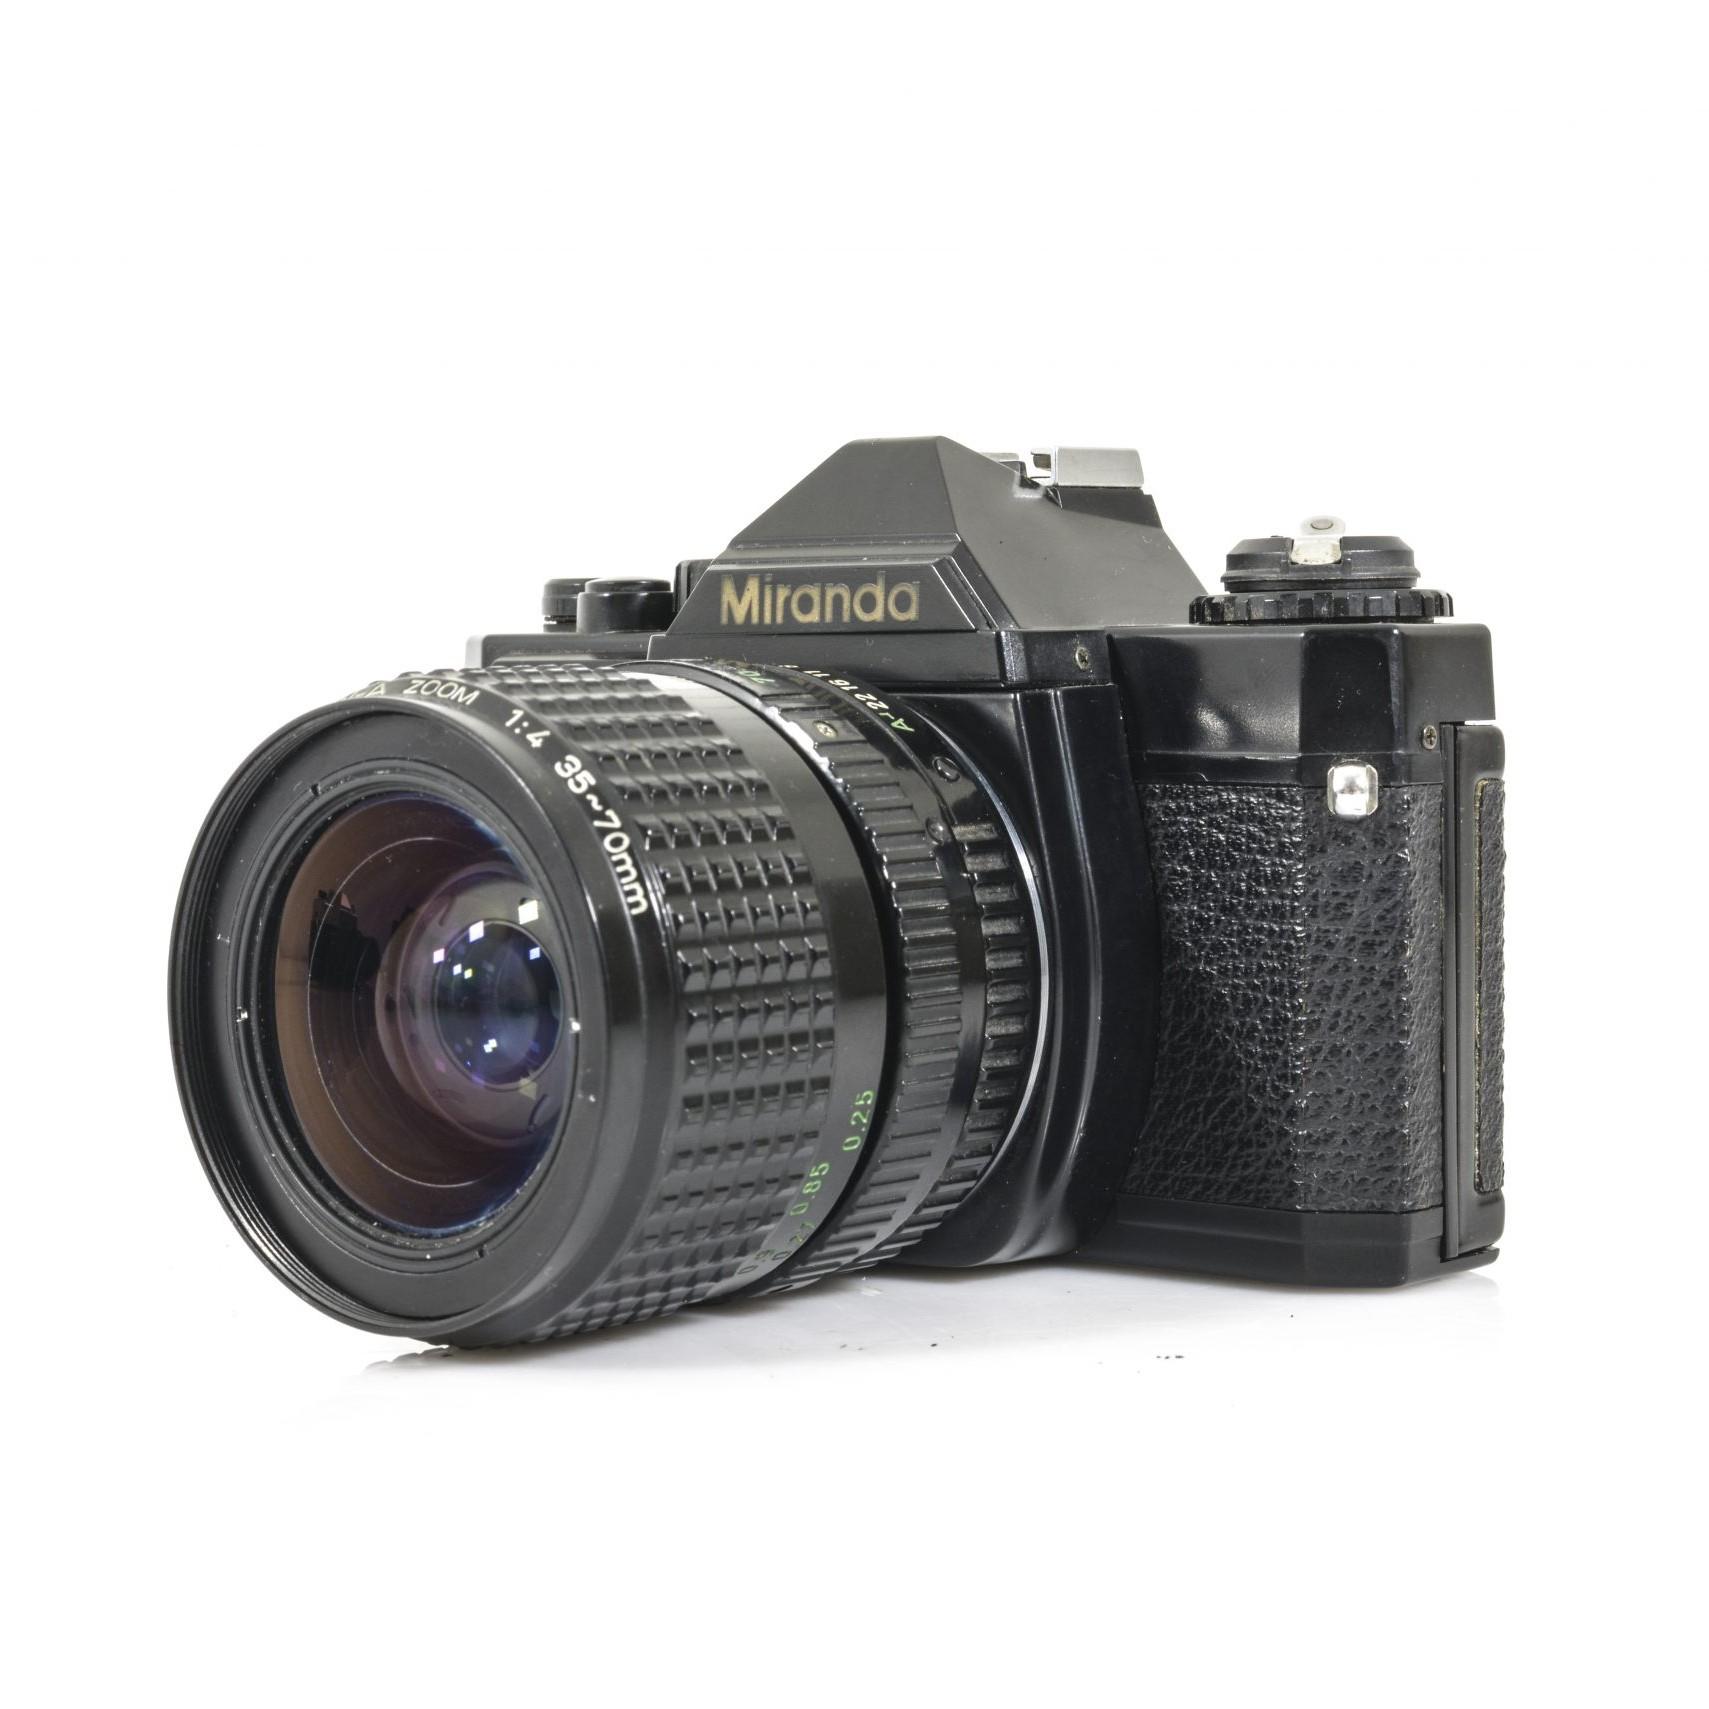 Miranda MS-1 35mm Film SLR Camera with RARE SMC Pentax A 35-70mm Zoom Lens